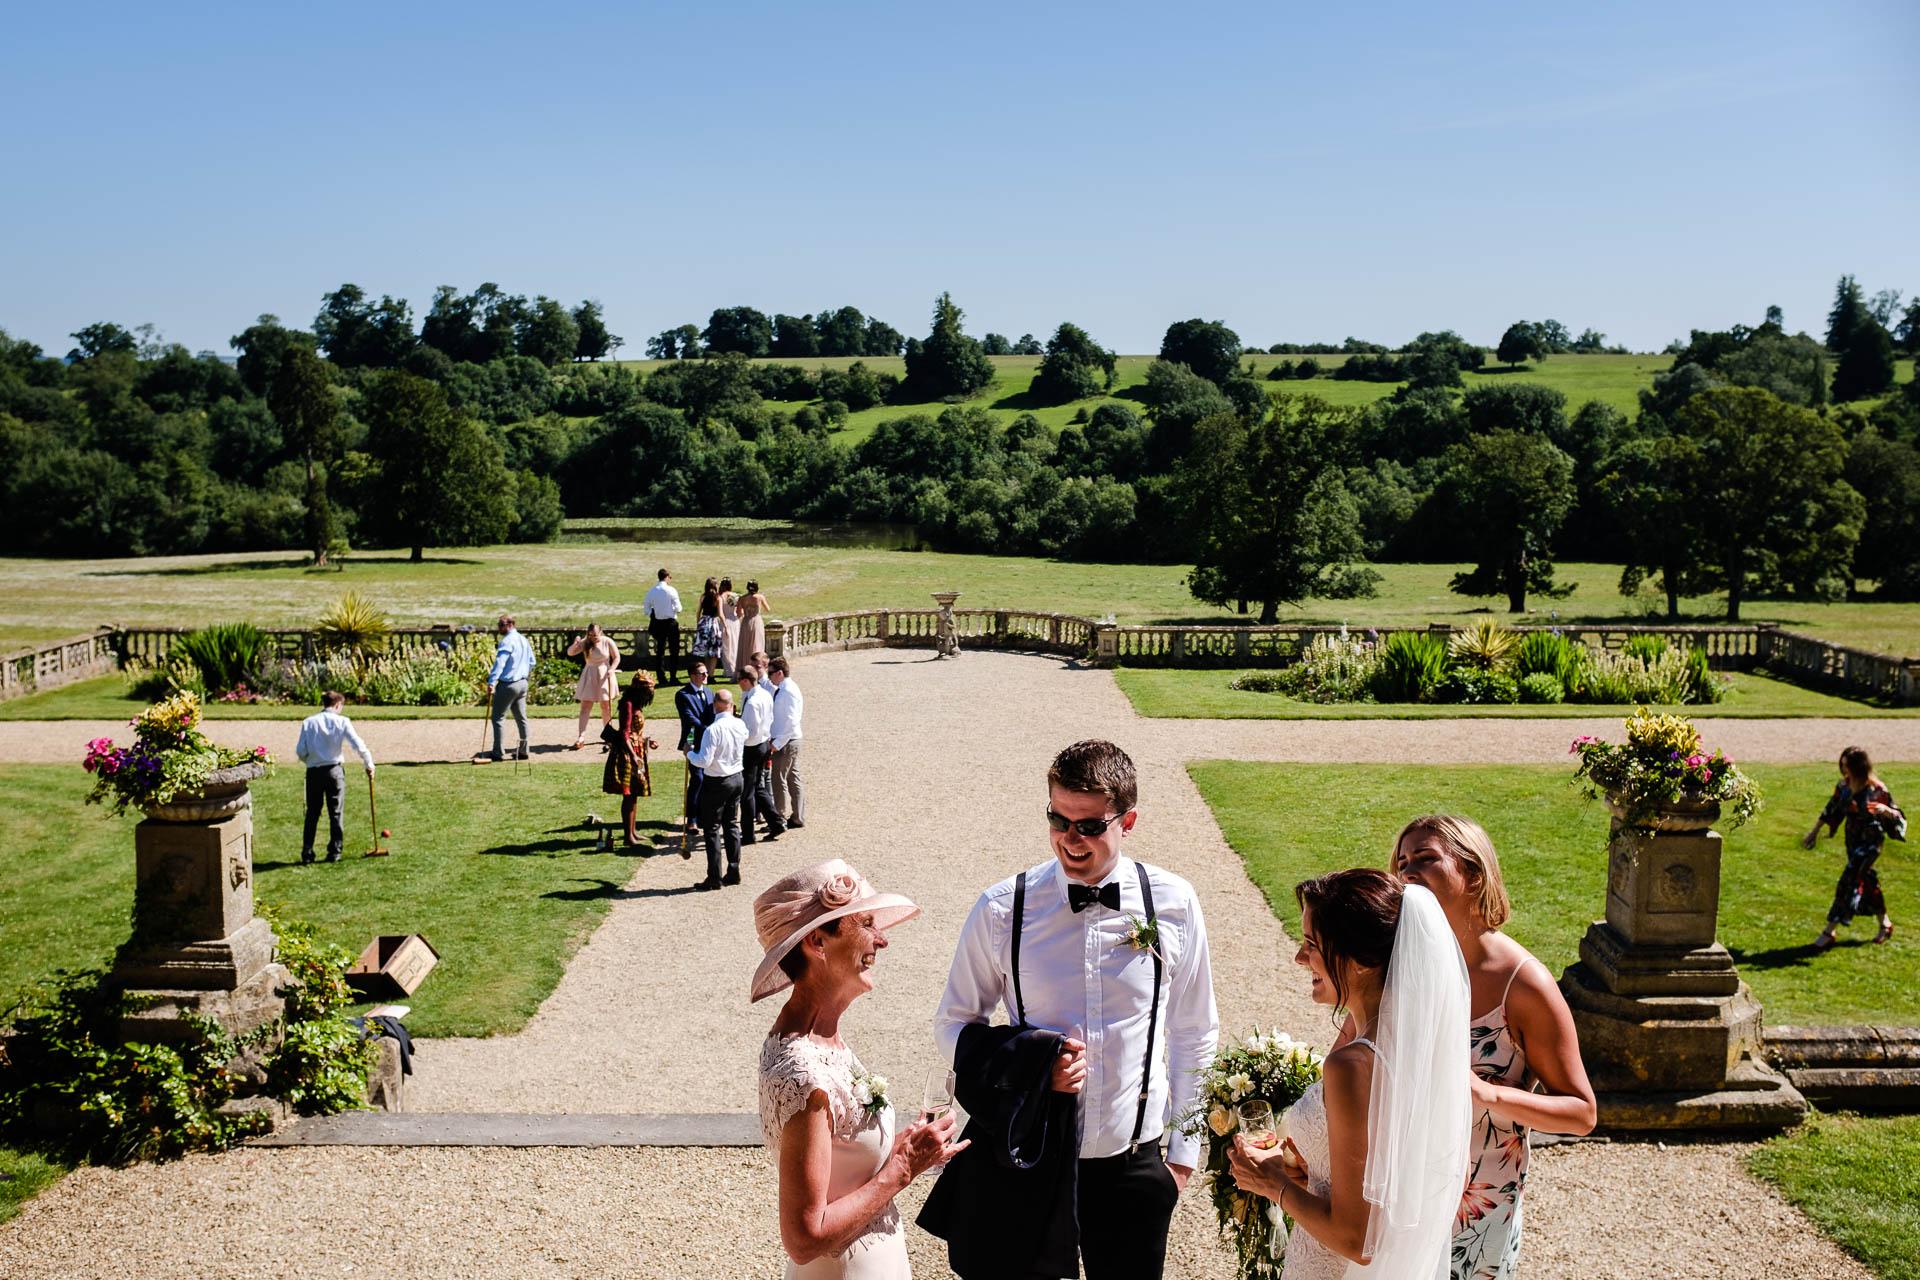 orchardleigh house wedding - Danni & Barney (262).jpg